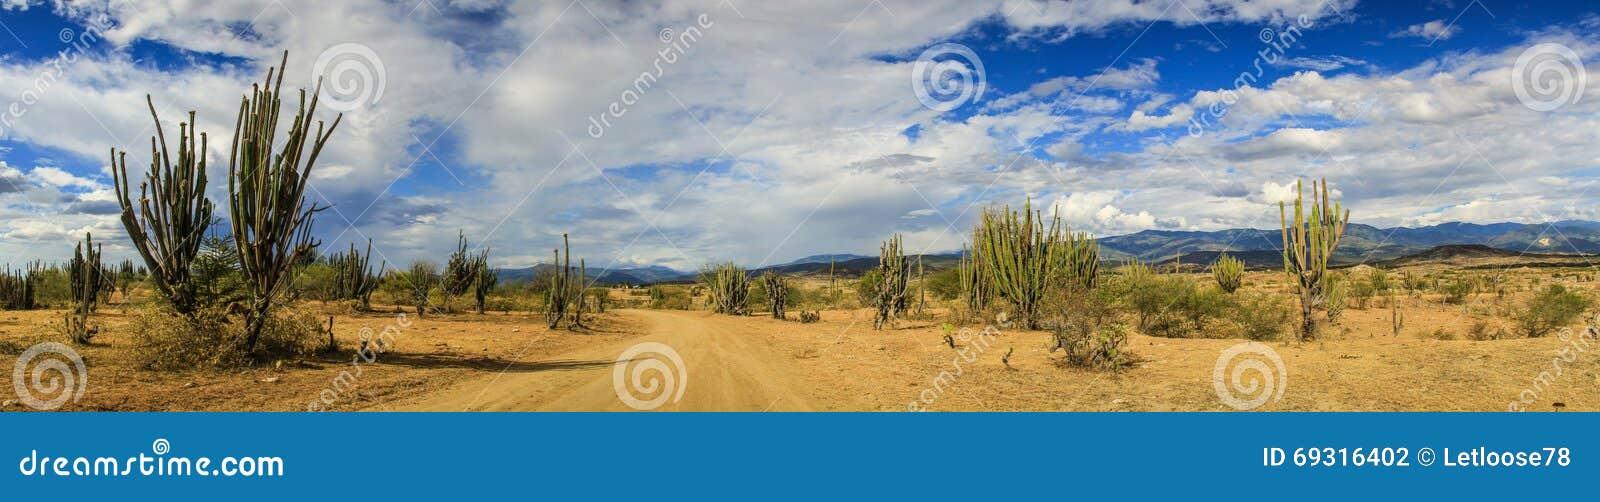 Panoramic view of the Tatacoa Desert, Colombia